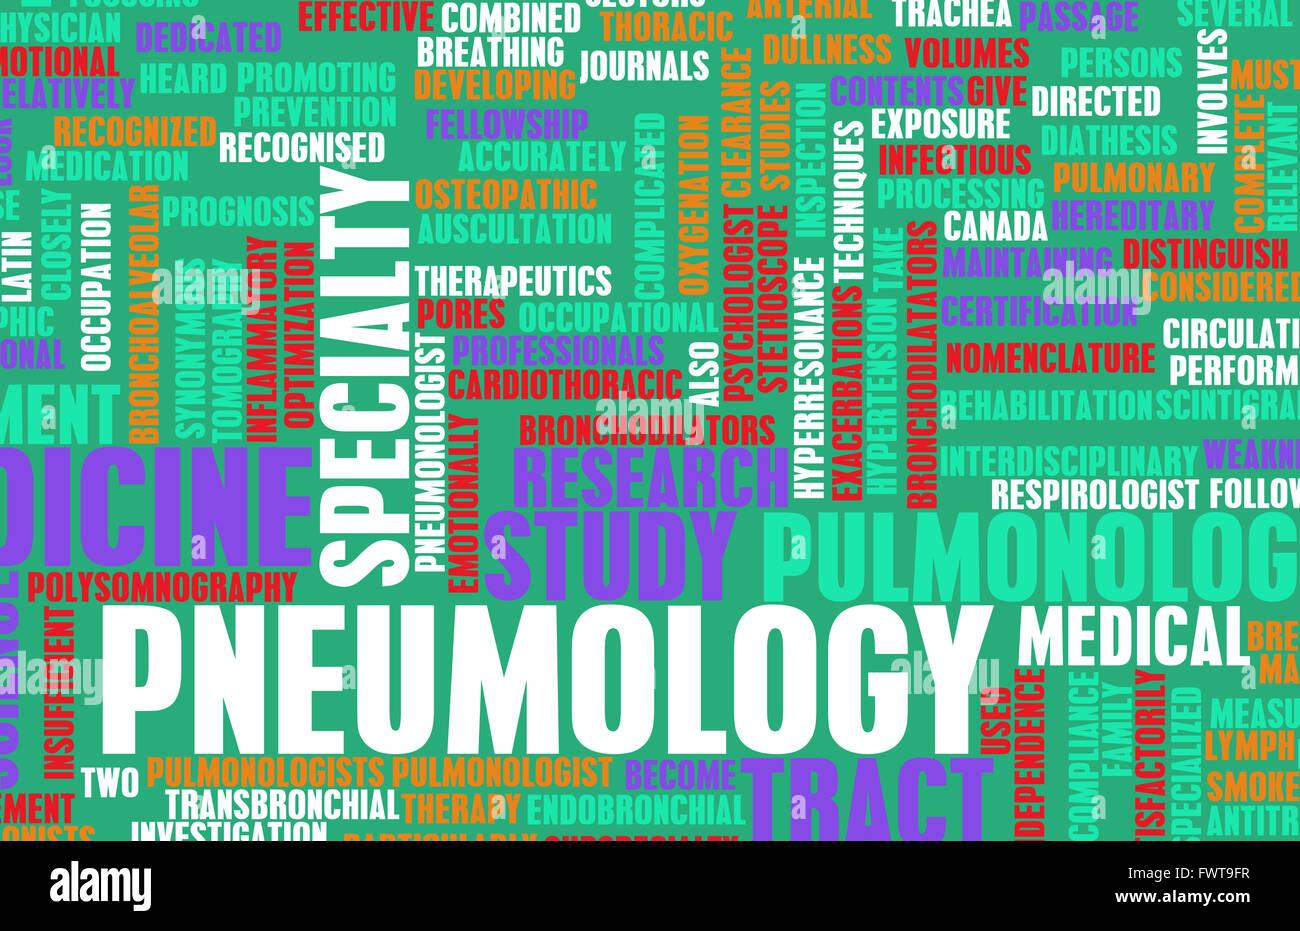 Pneumology or Pneumologist Medical Field Specialty As Art - Stock Image